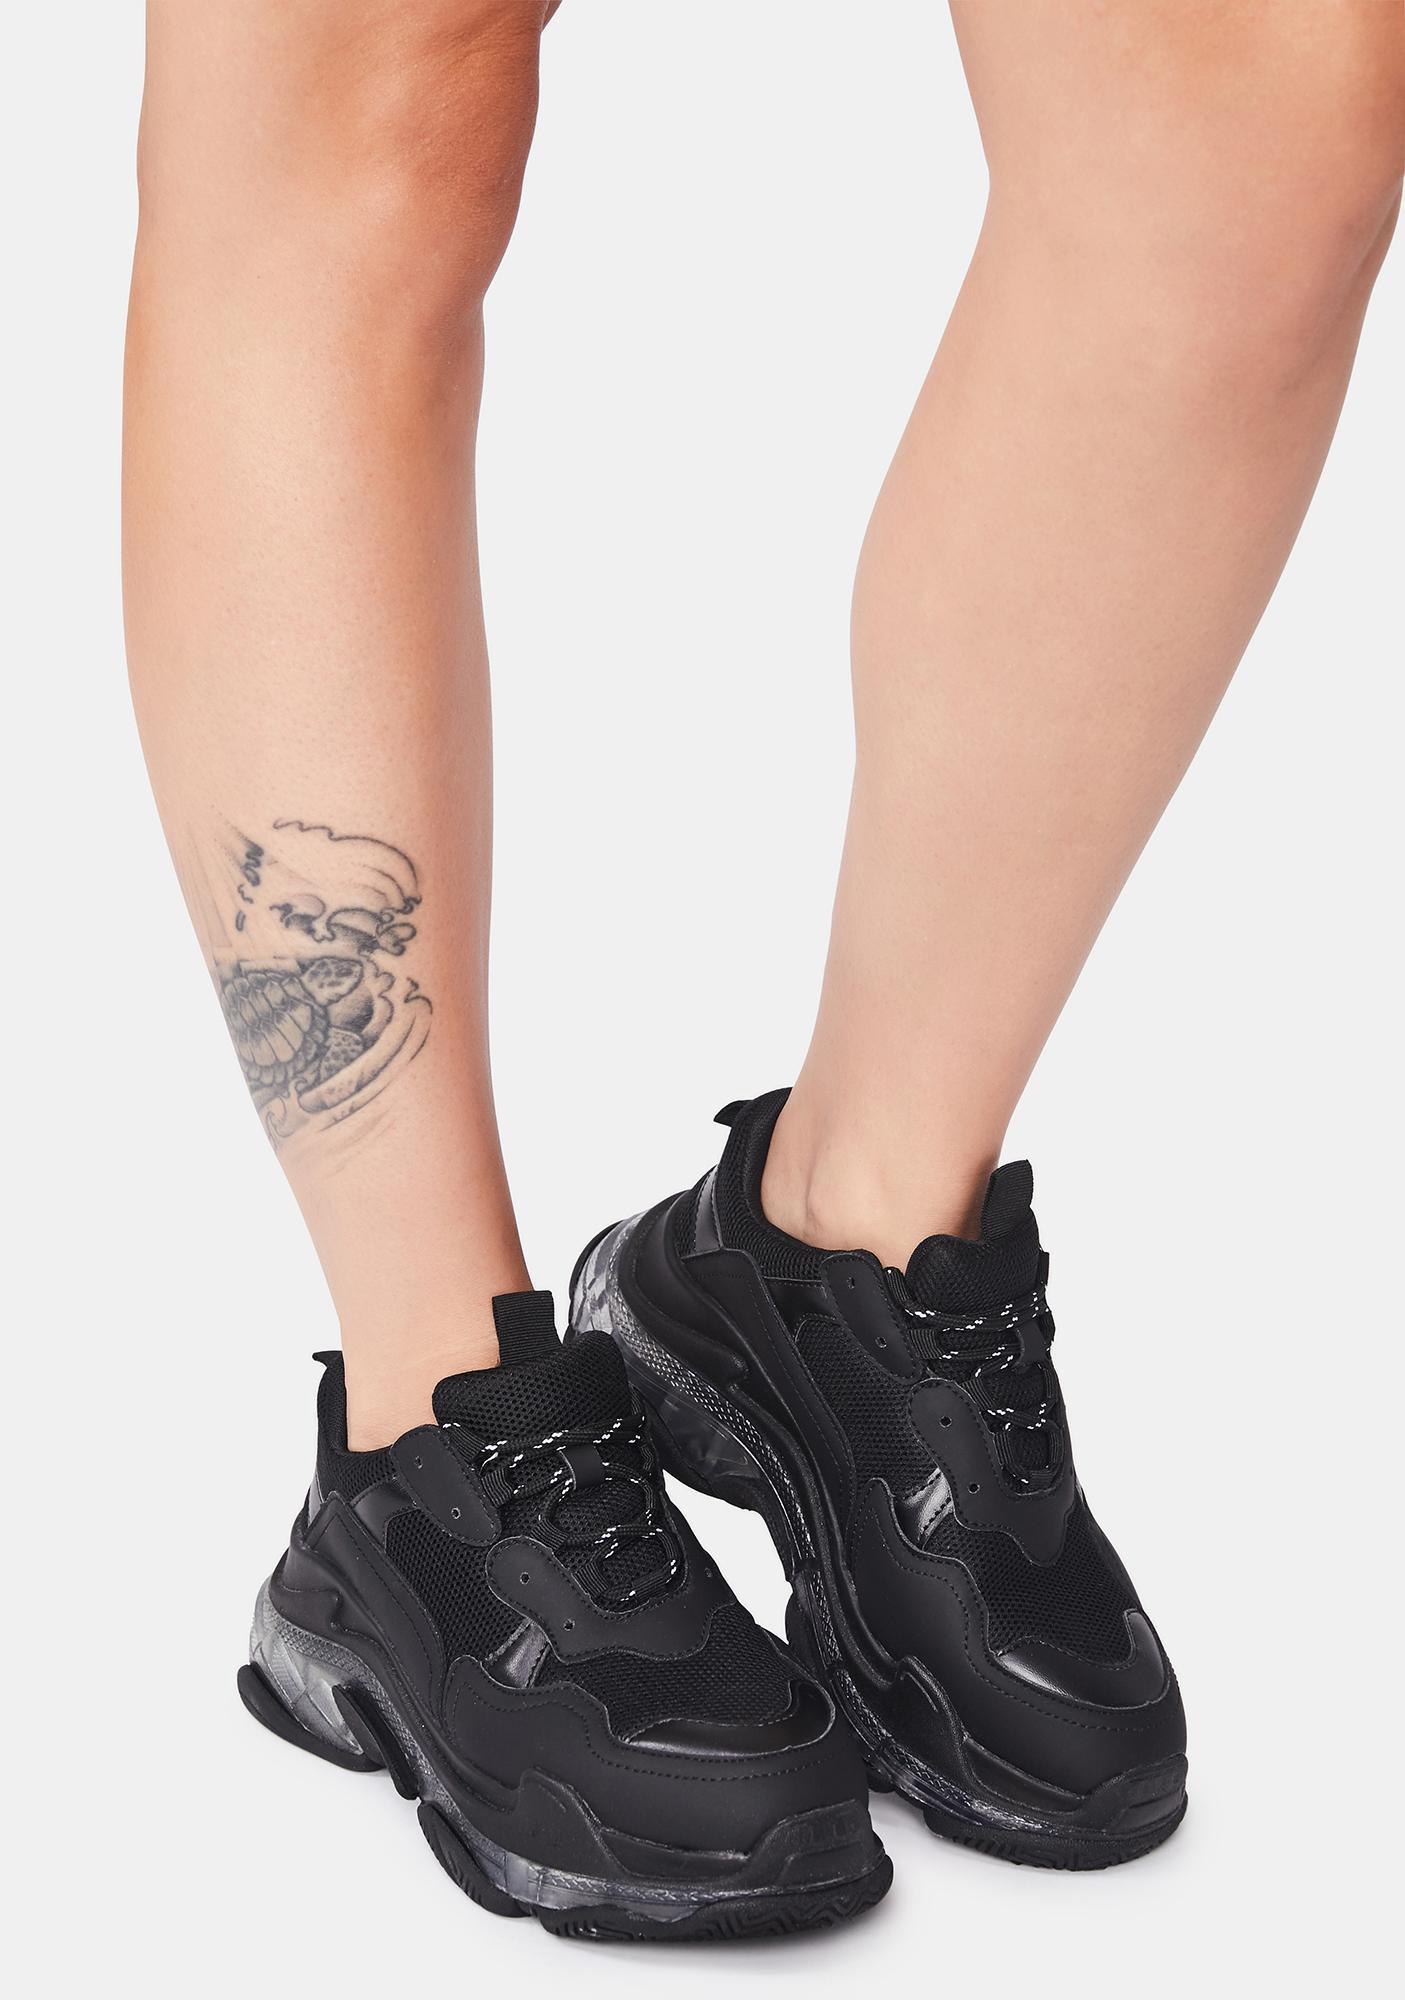 Nox New Paths Running Sneakers